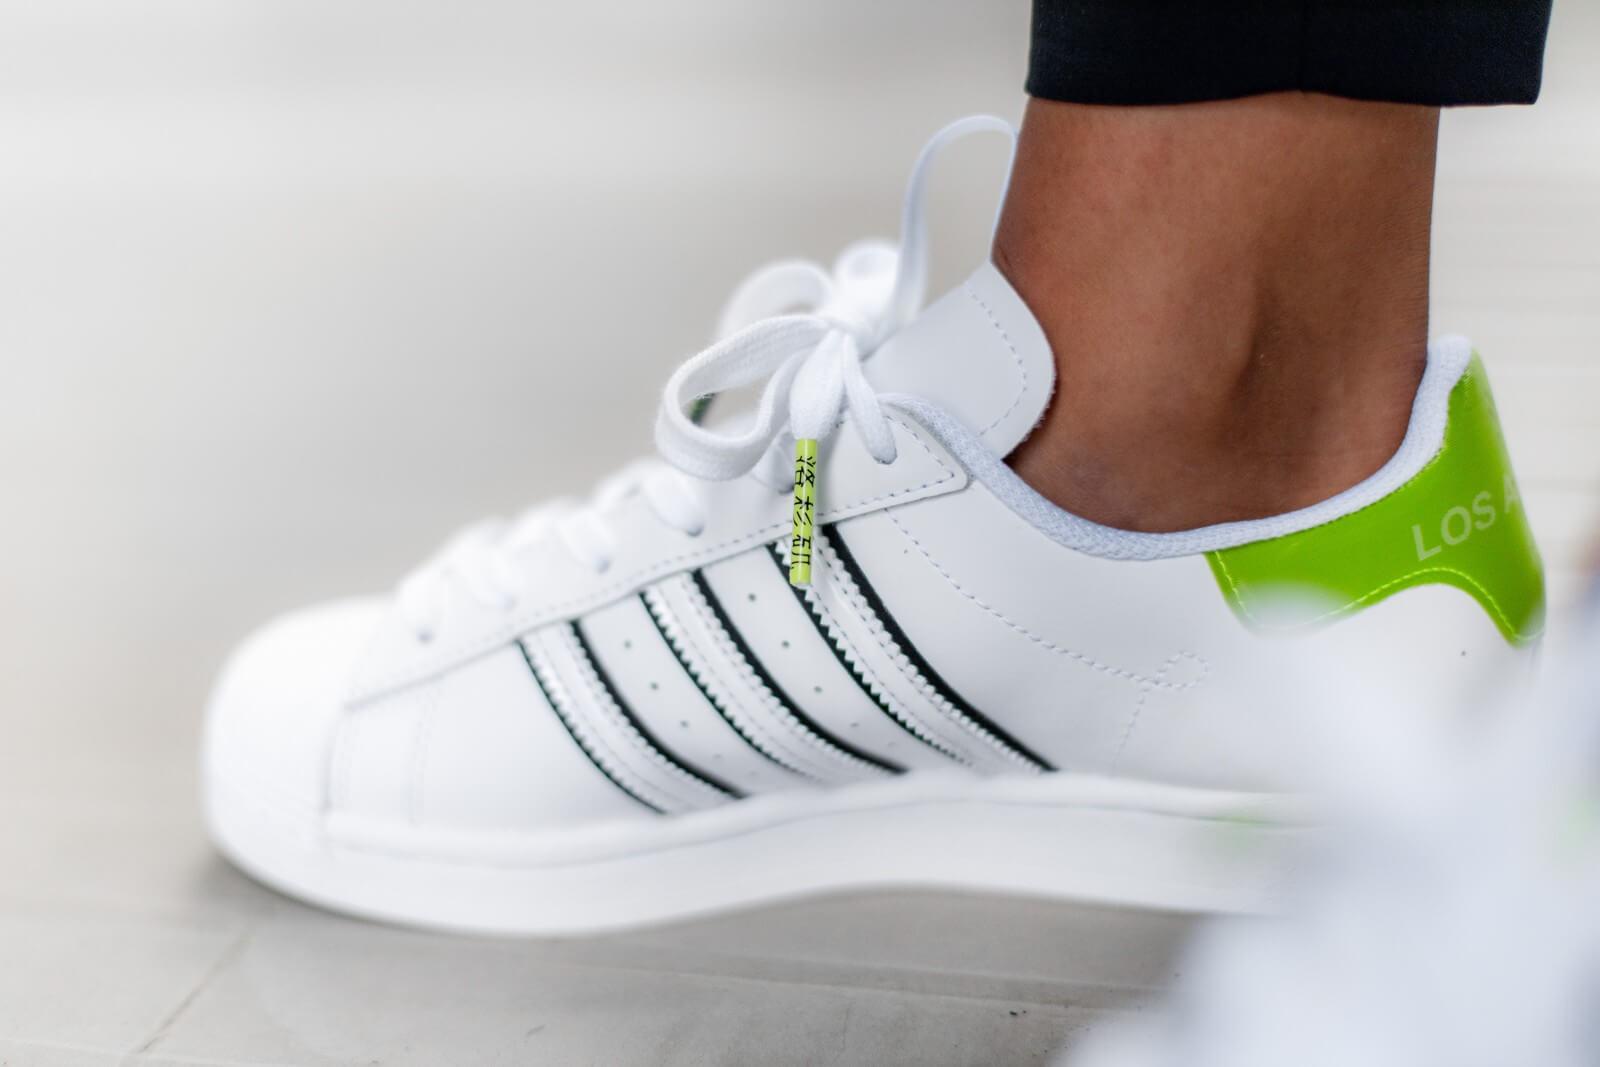 adidas Originals Celebrates Los Angeles With This Special